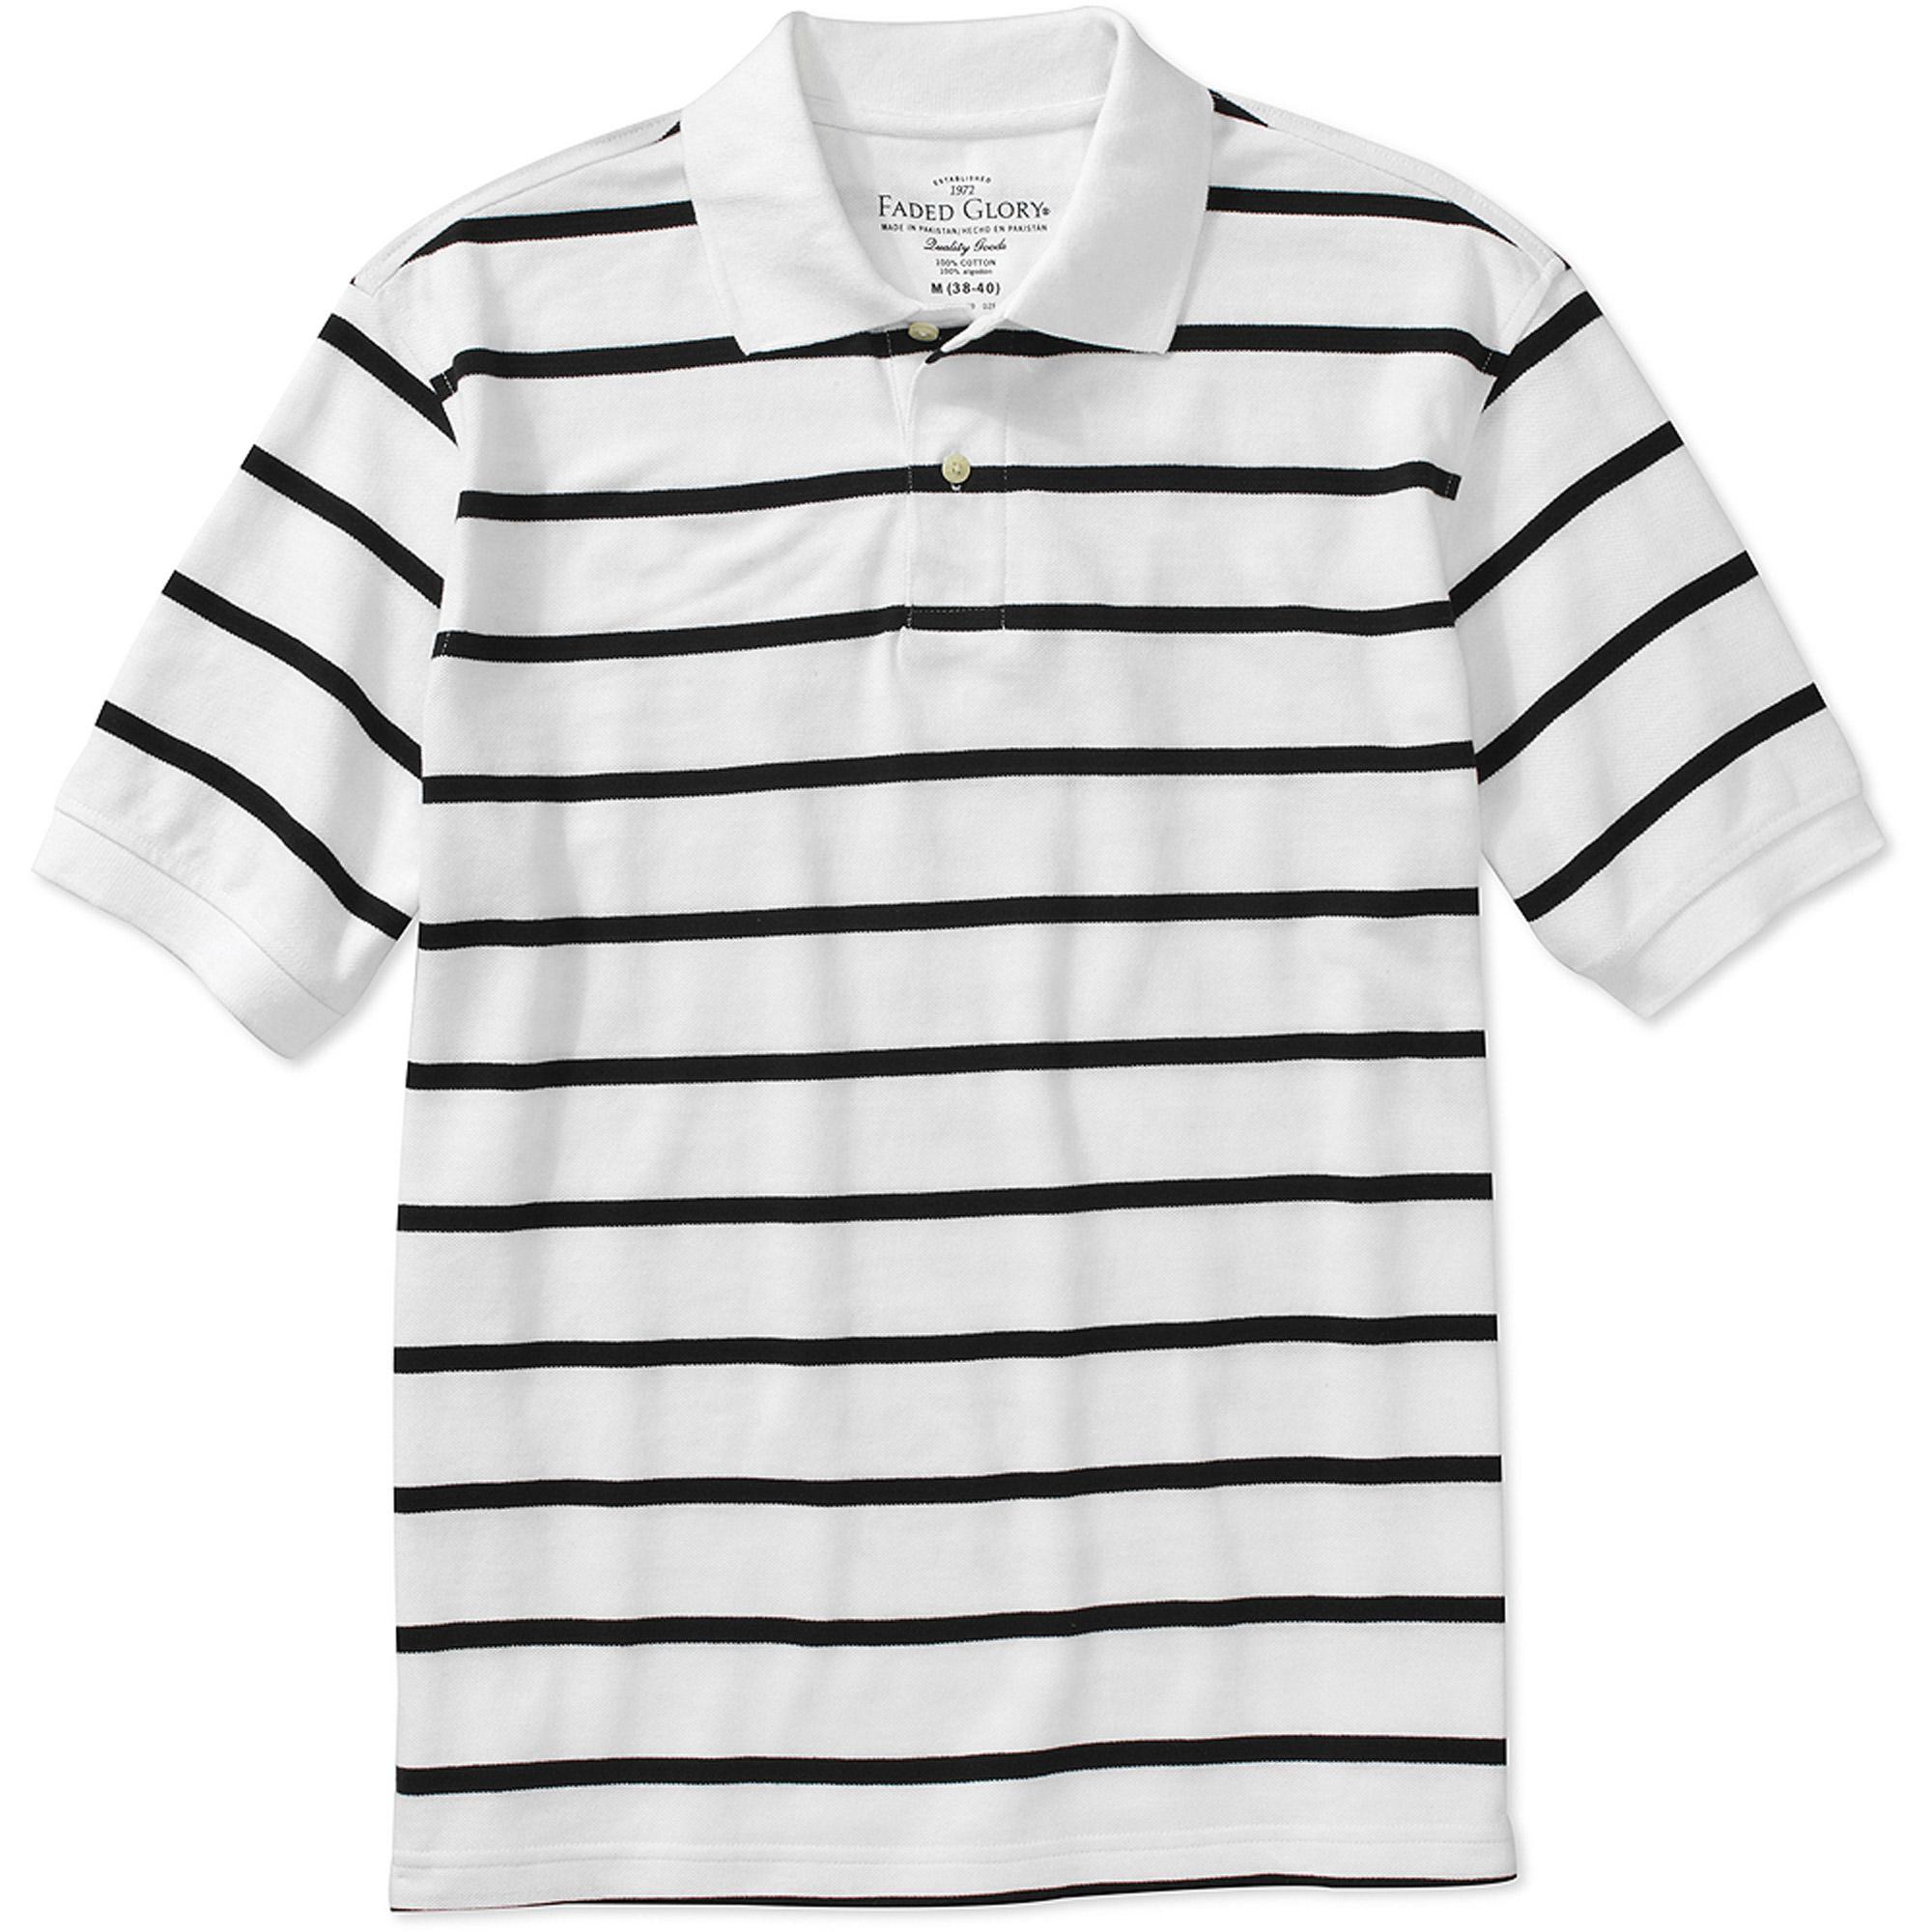 Faded Glory Big Men's Short Sleeve Stripe Polo